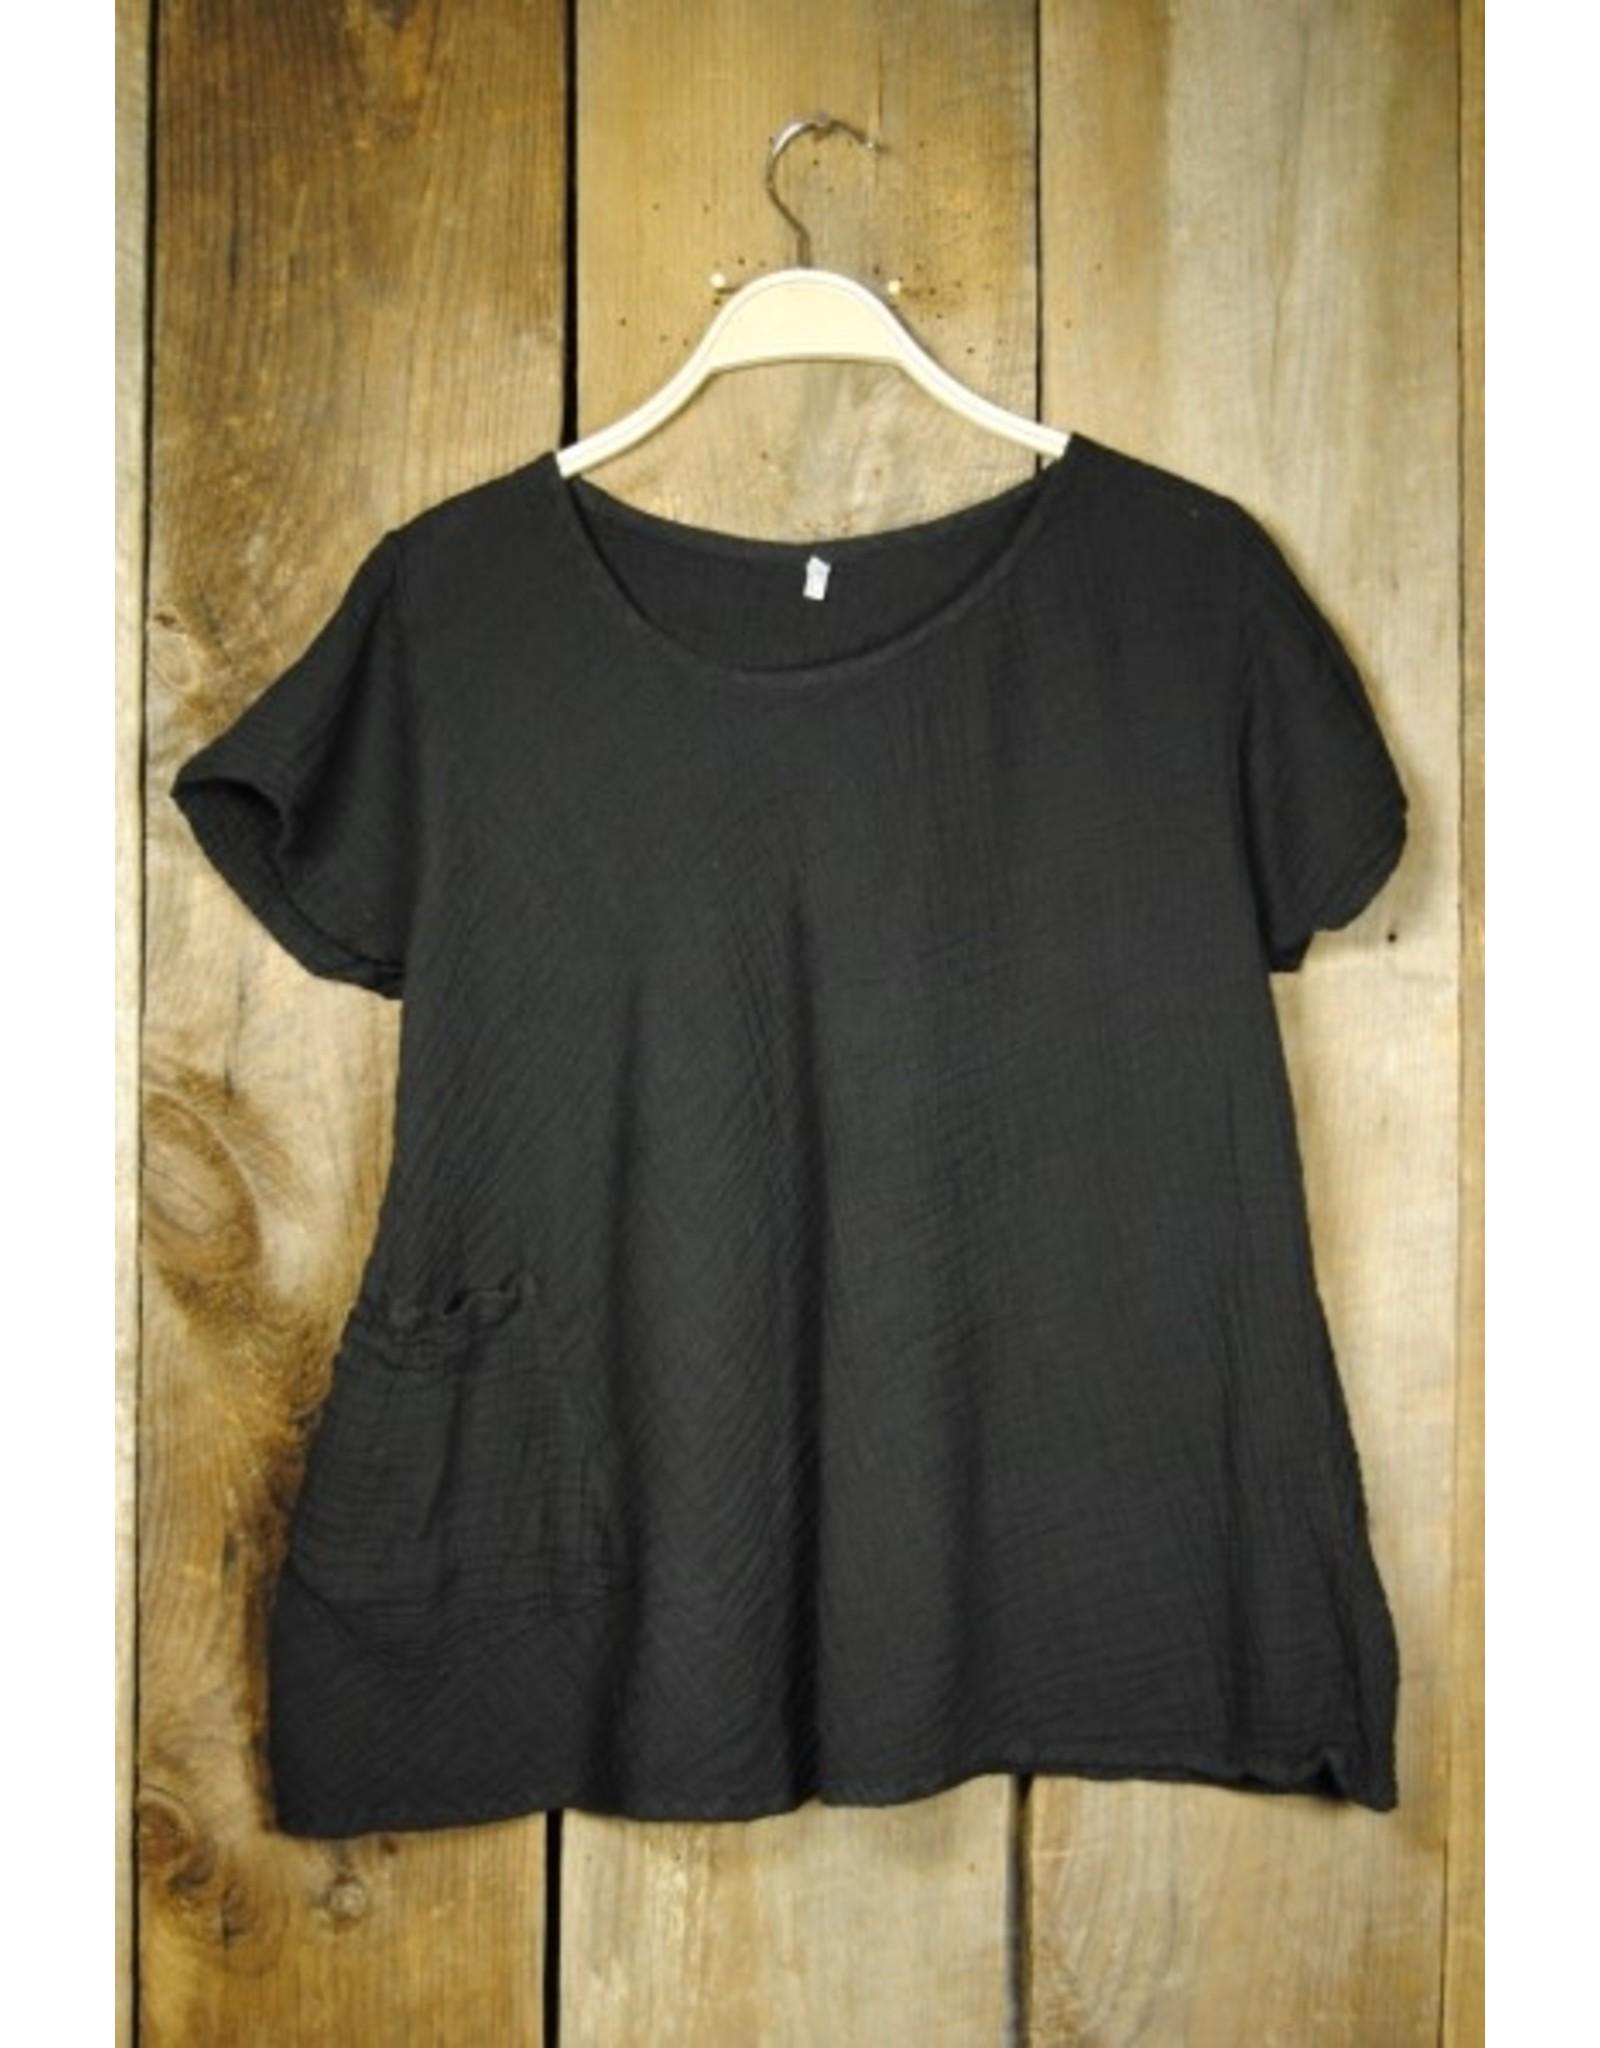 One Pocket, Short Sleeve, Black